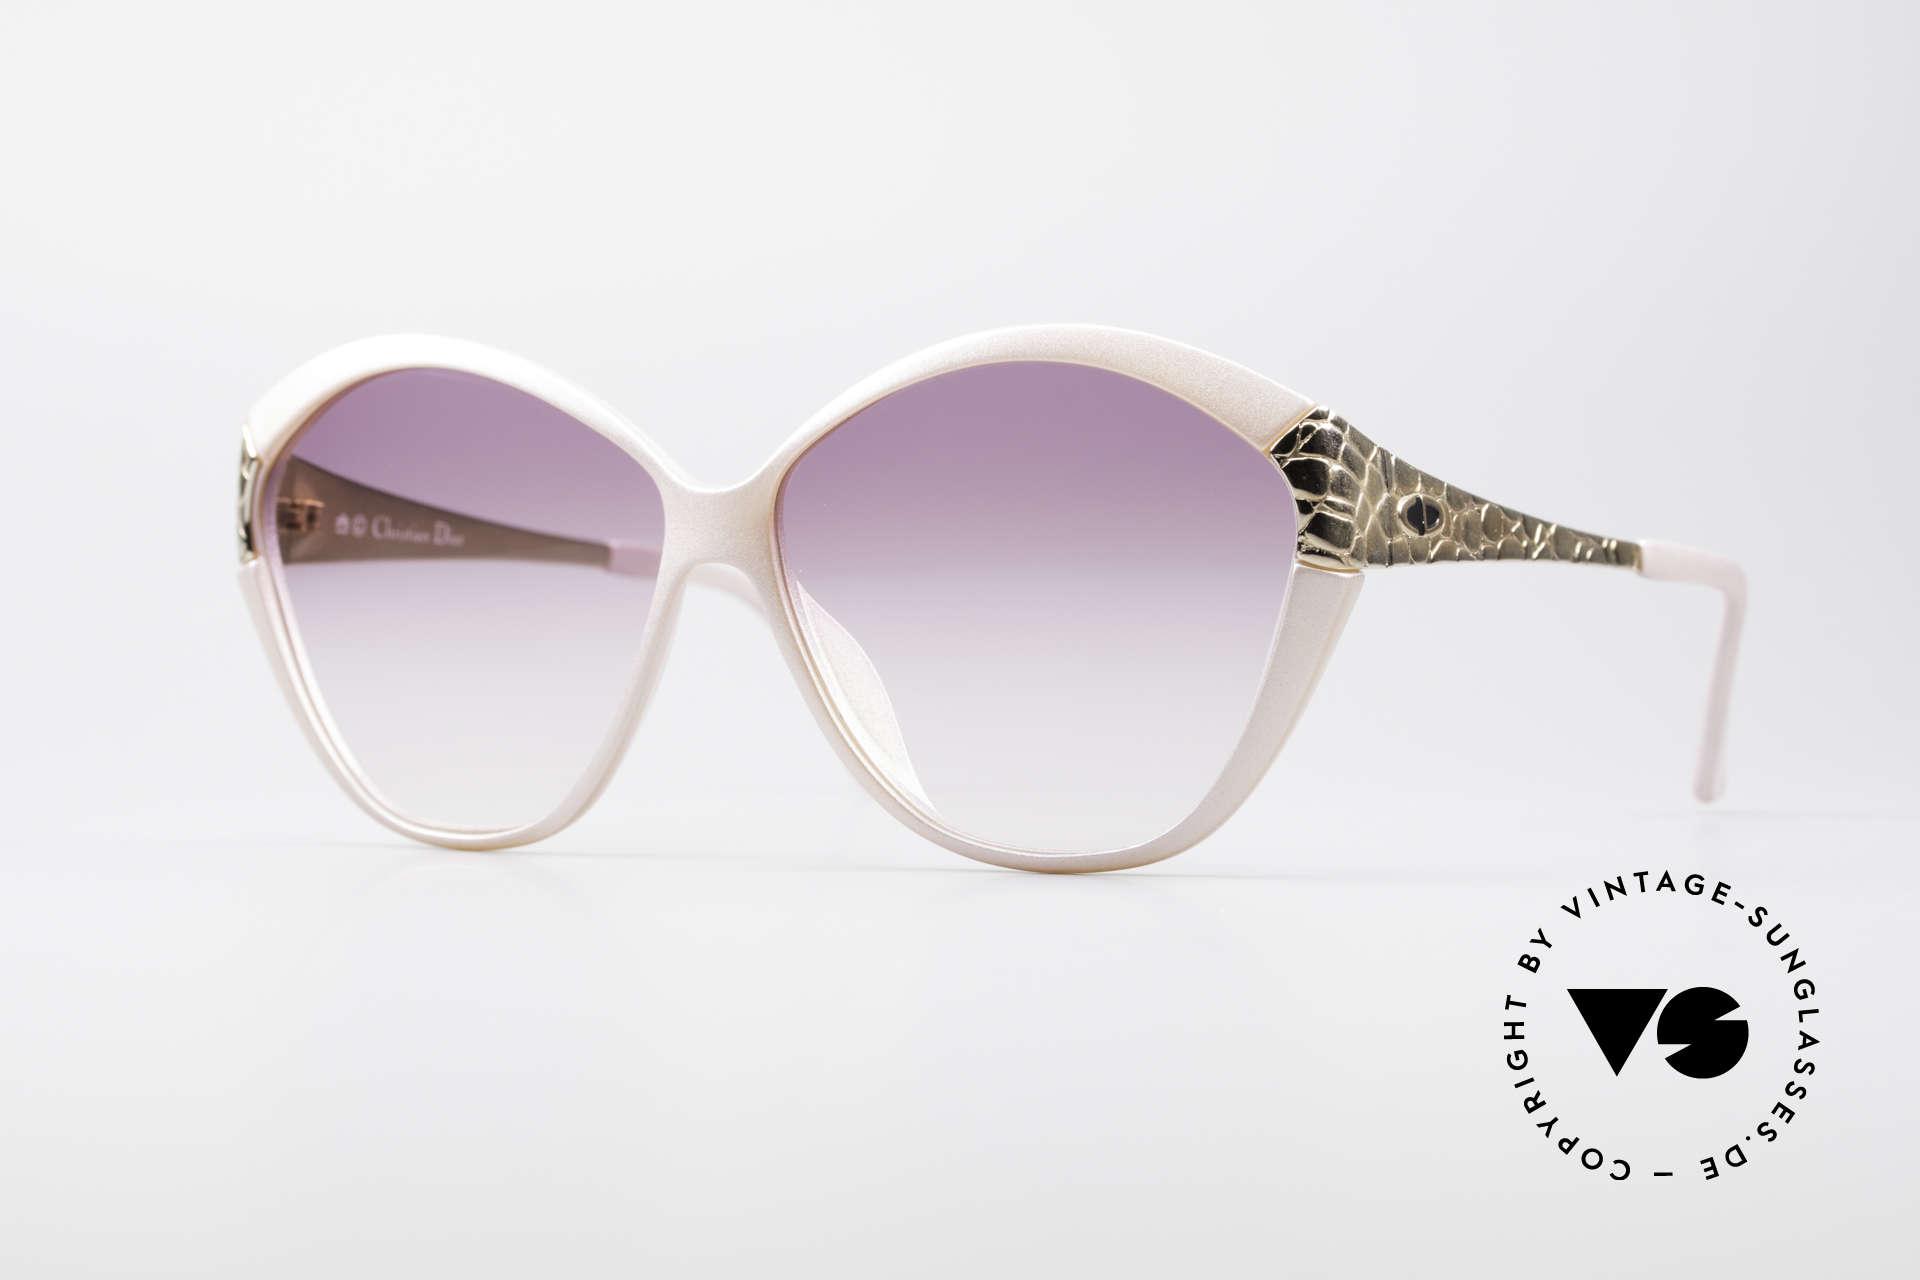 Christian Dior 2319 Pink Ladies Designer Shades, oversized vintage DIOR designer sunglasses, Made for Women